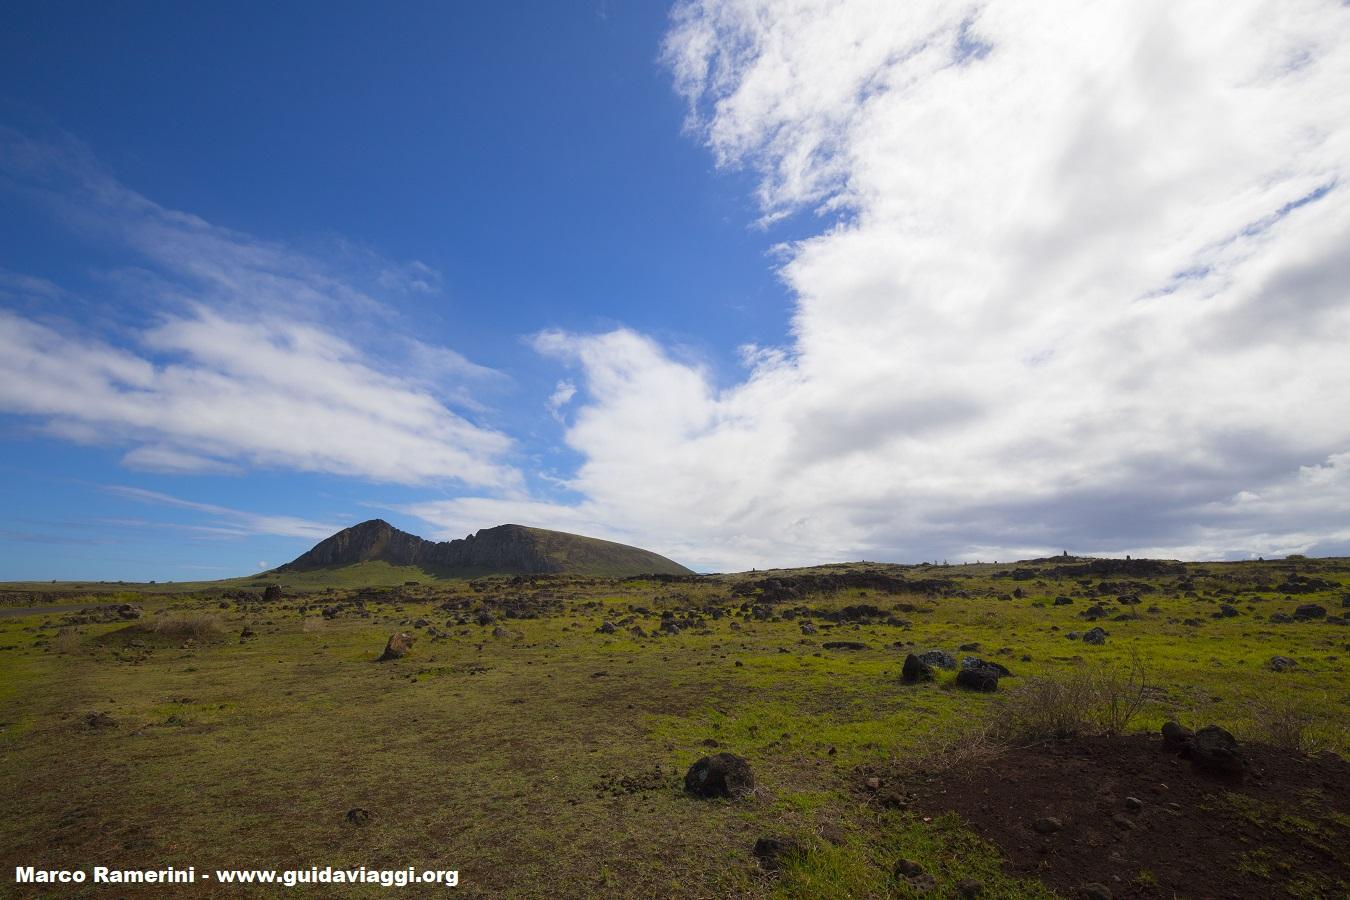 Rano Raraku, Île de Pâques, Chili. Auteur et Copyright Marco Ramerini